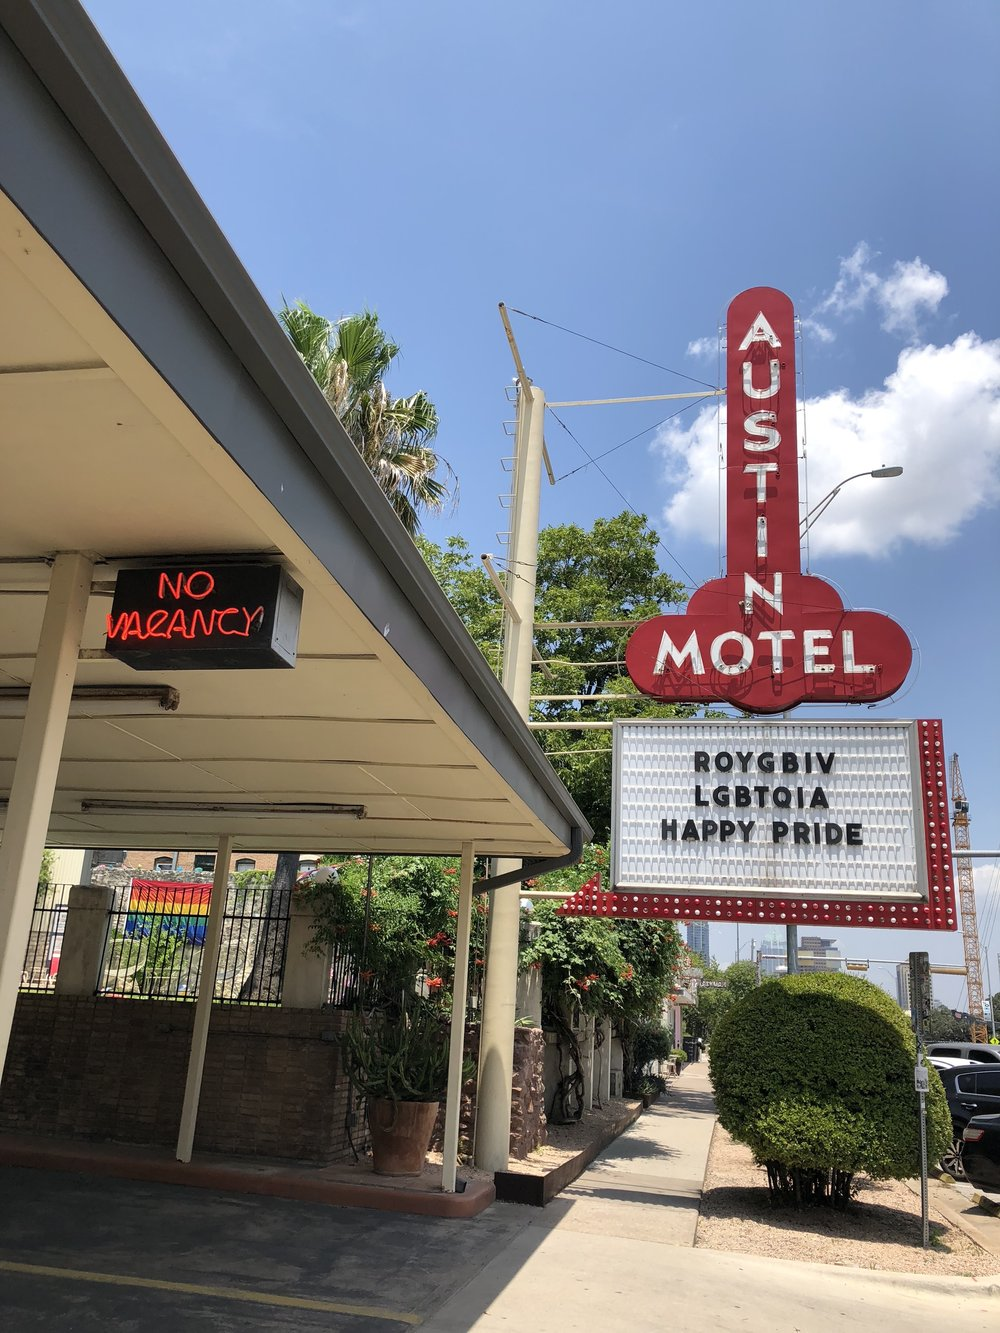 austin-motel-texas.jpg